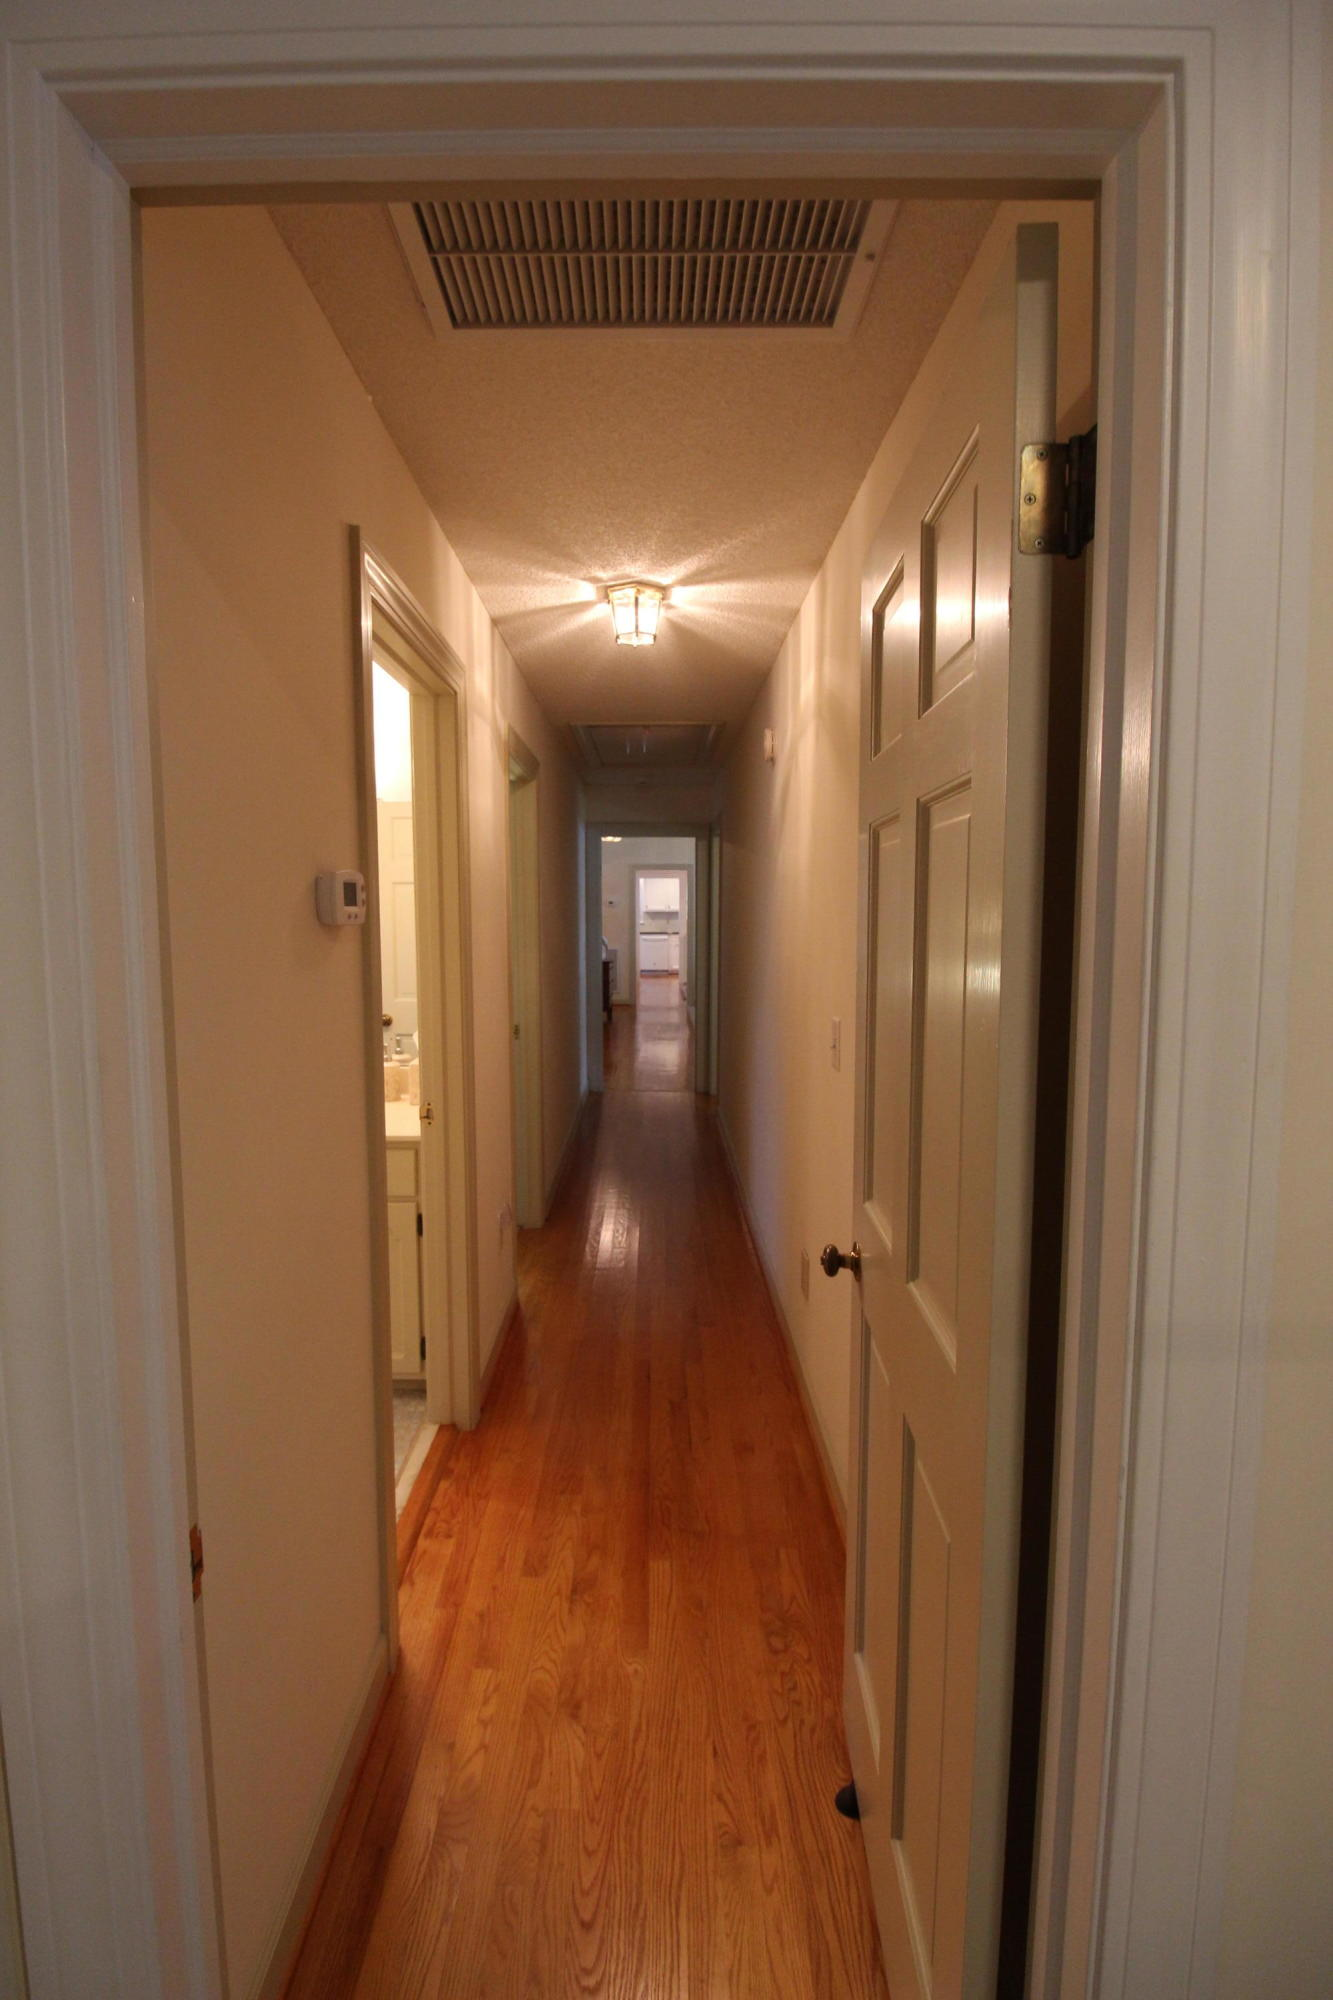 Lawton Bluff Homes For Sale - 735 Lawton Pl, Charleston, SC - 87